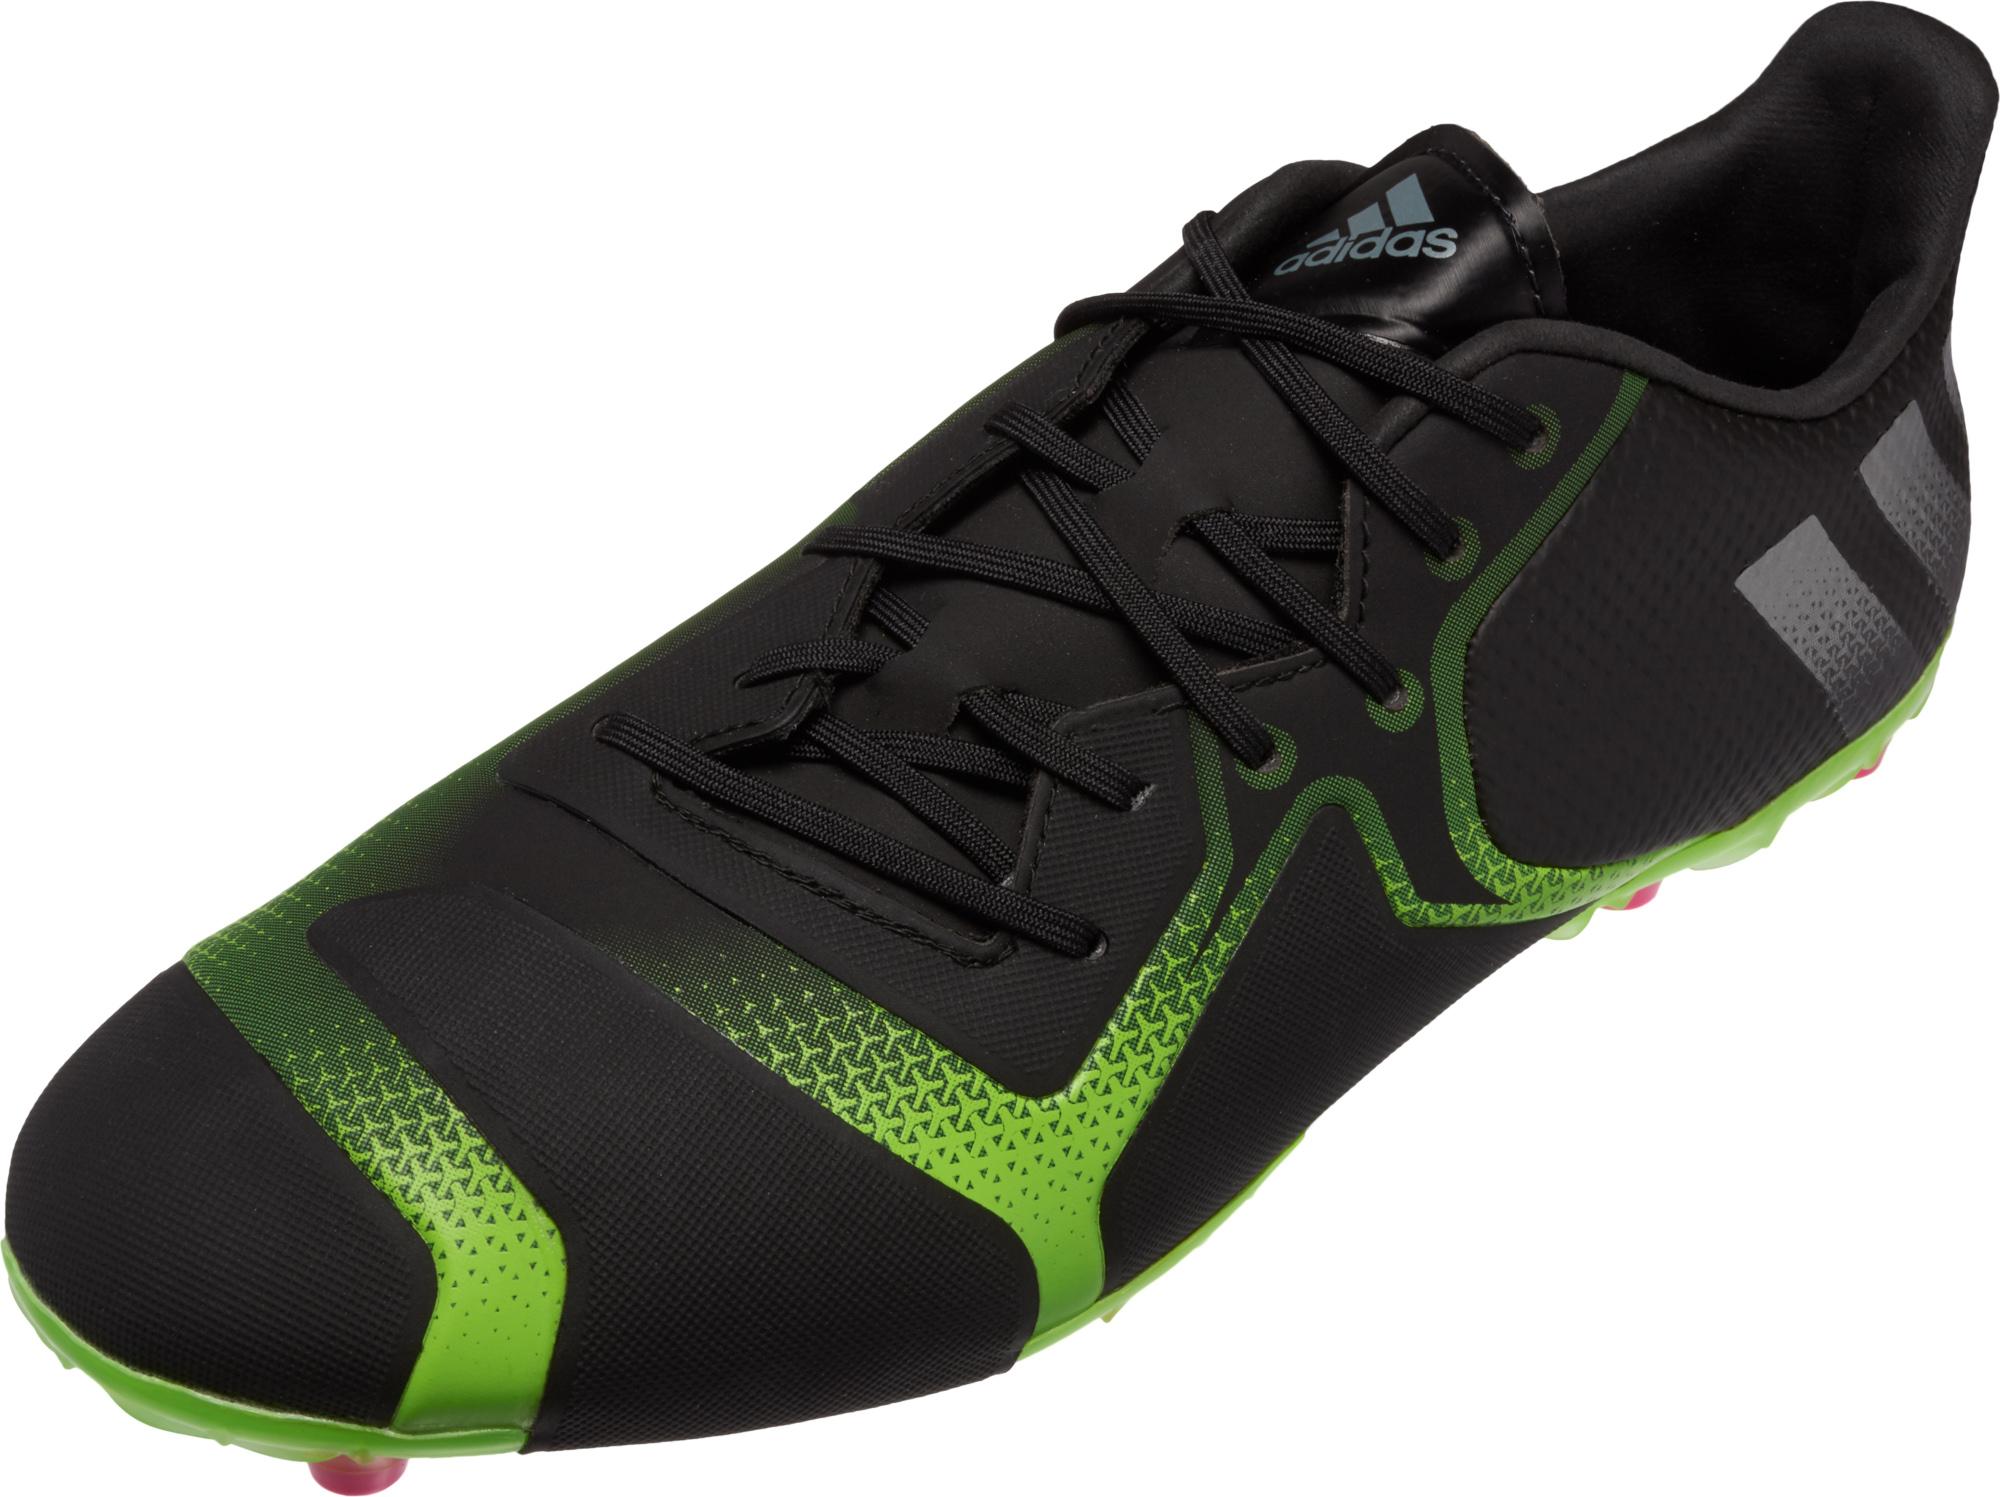 new arrival 3092a 1623d adidas ACE 16 TKRZ Soccer Shoes – Solar Green